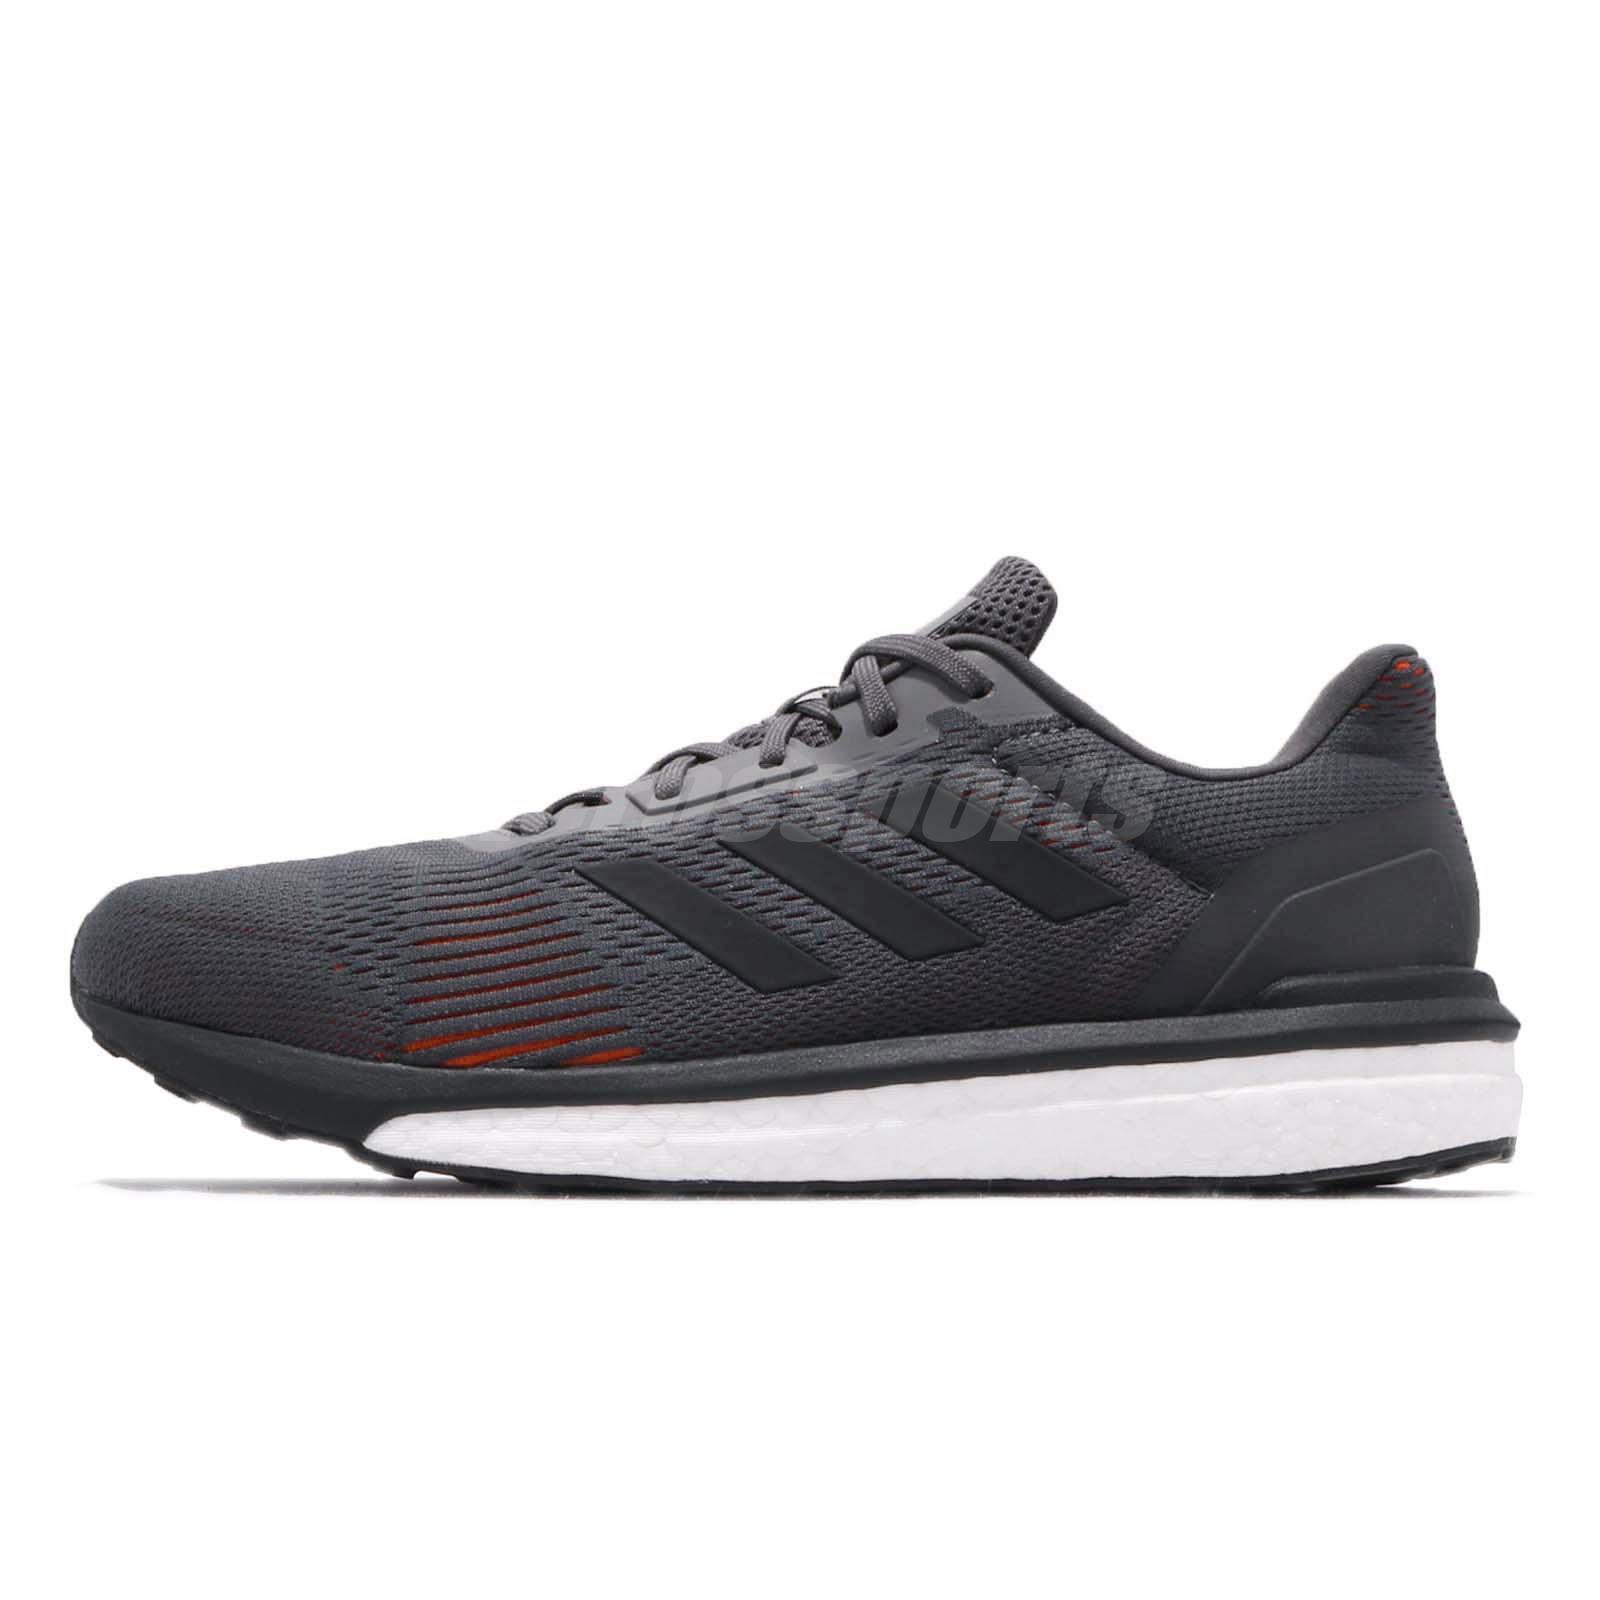 01c22bf49 adidas Solar Drive ST M Boost Grey Carbon Hi-Res Red Men Running Shoes  AQ0325